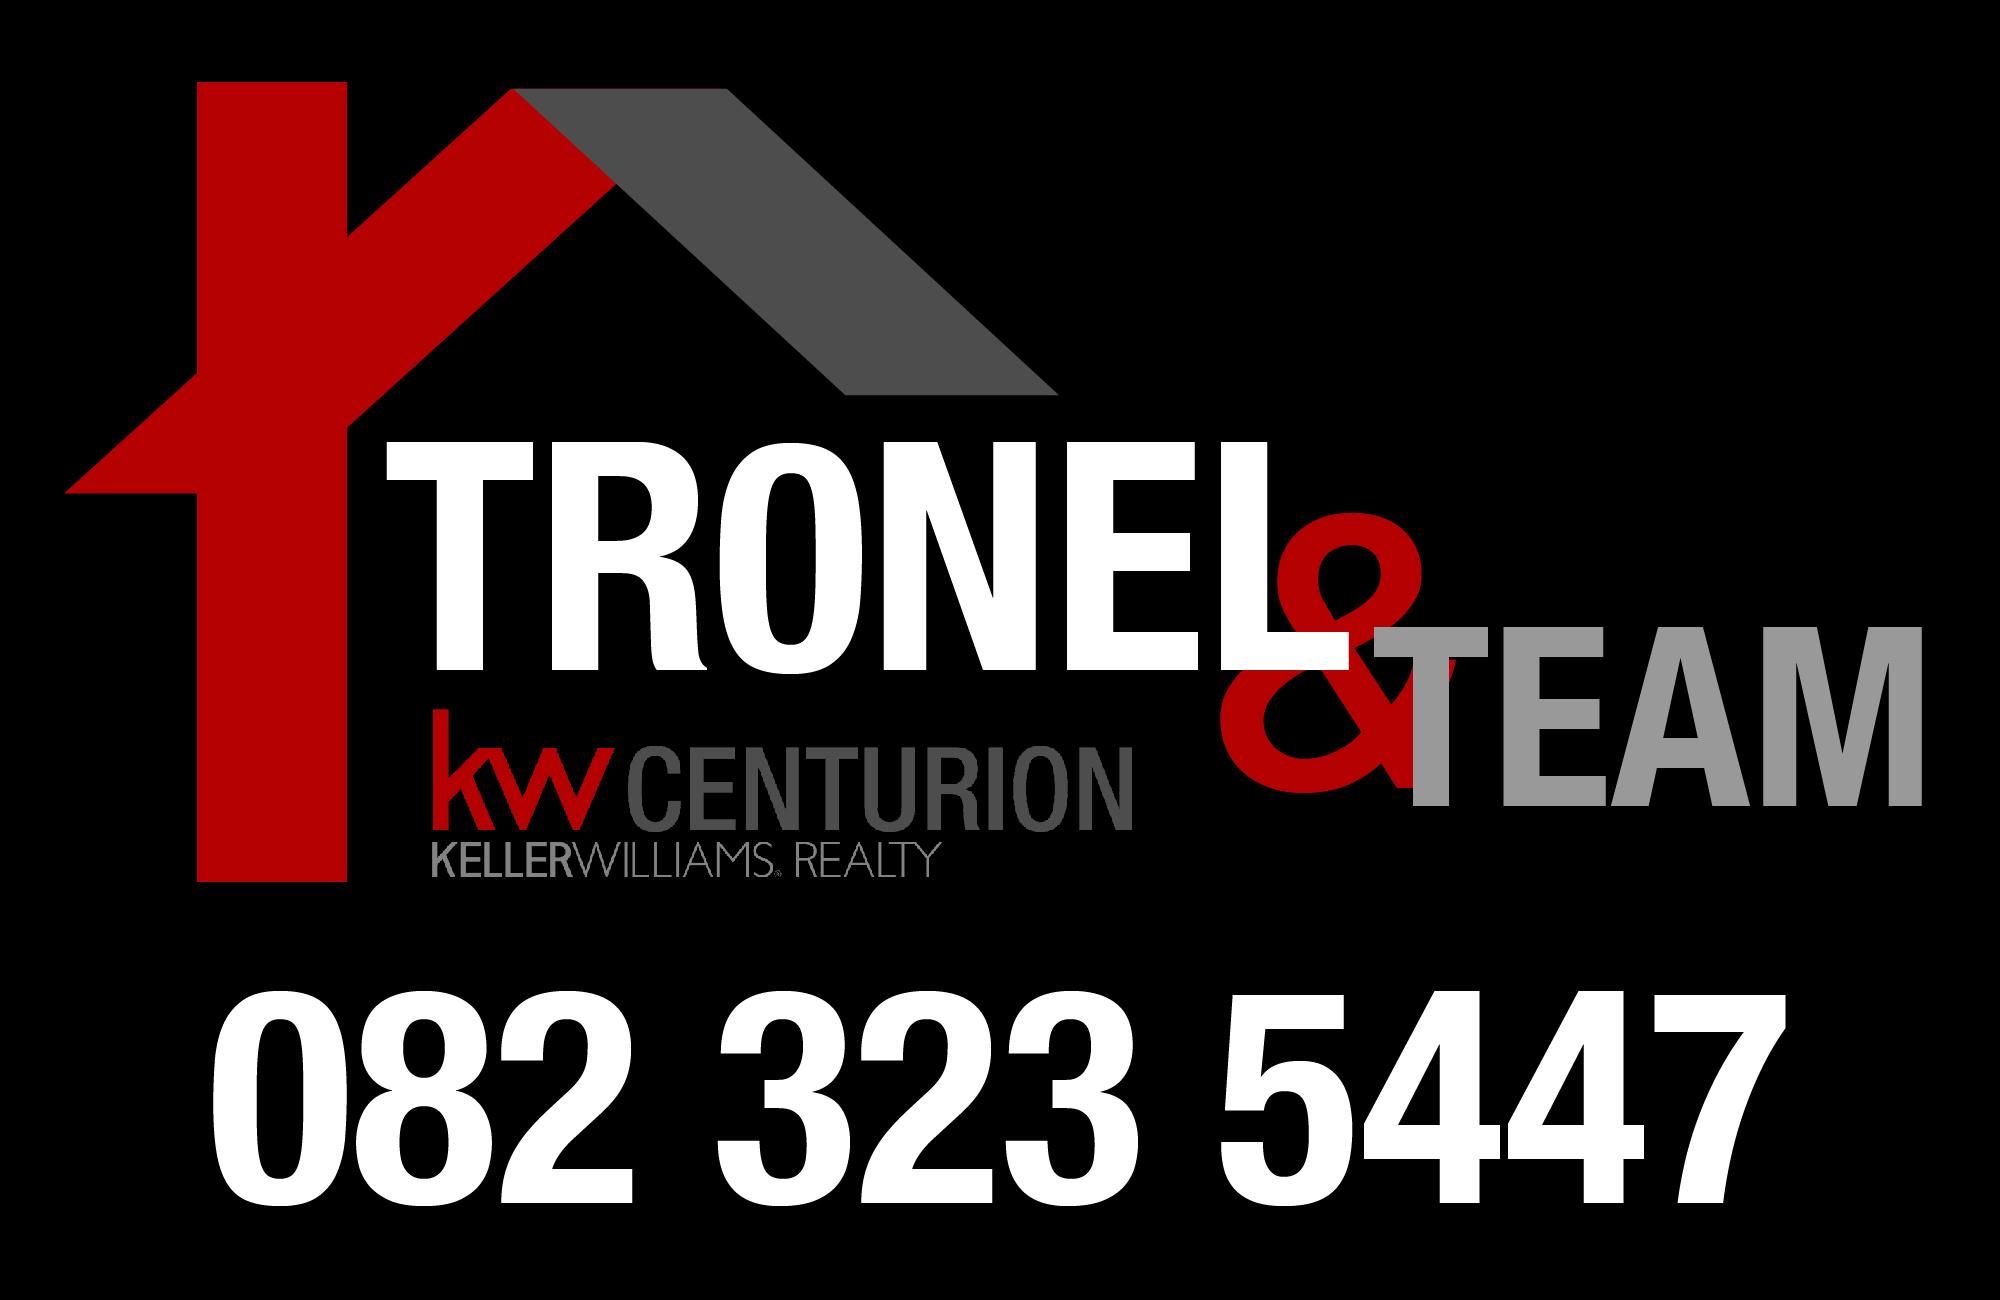 Tronel & Team